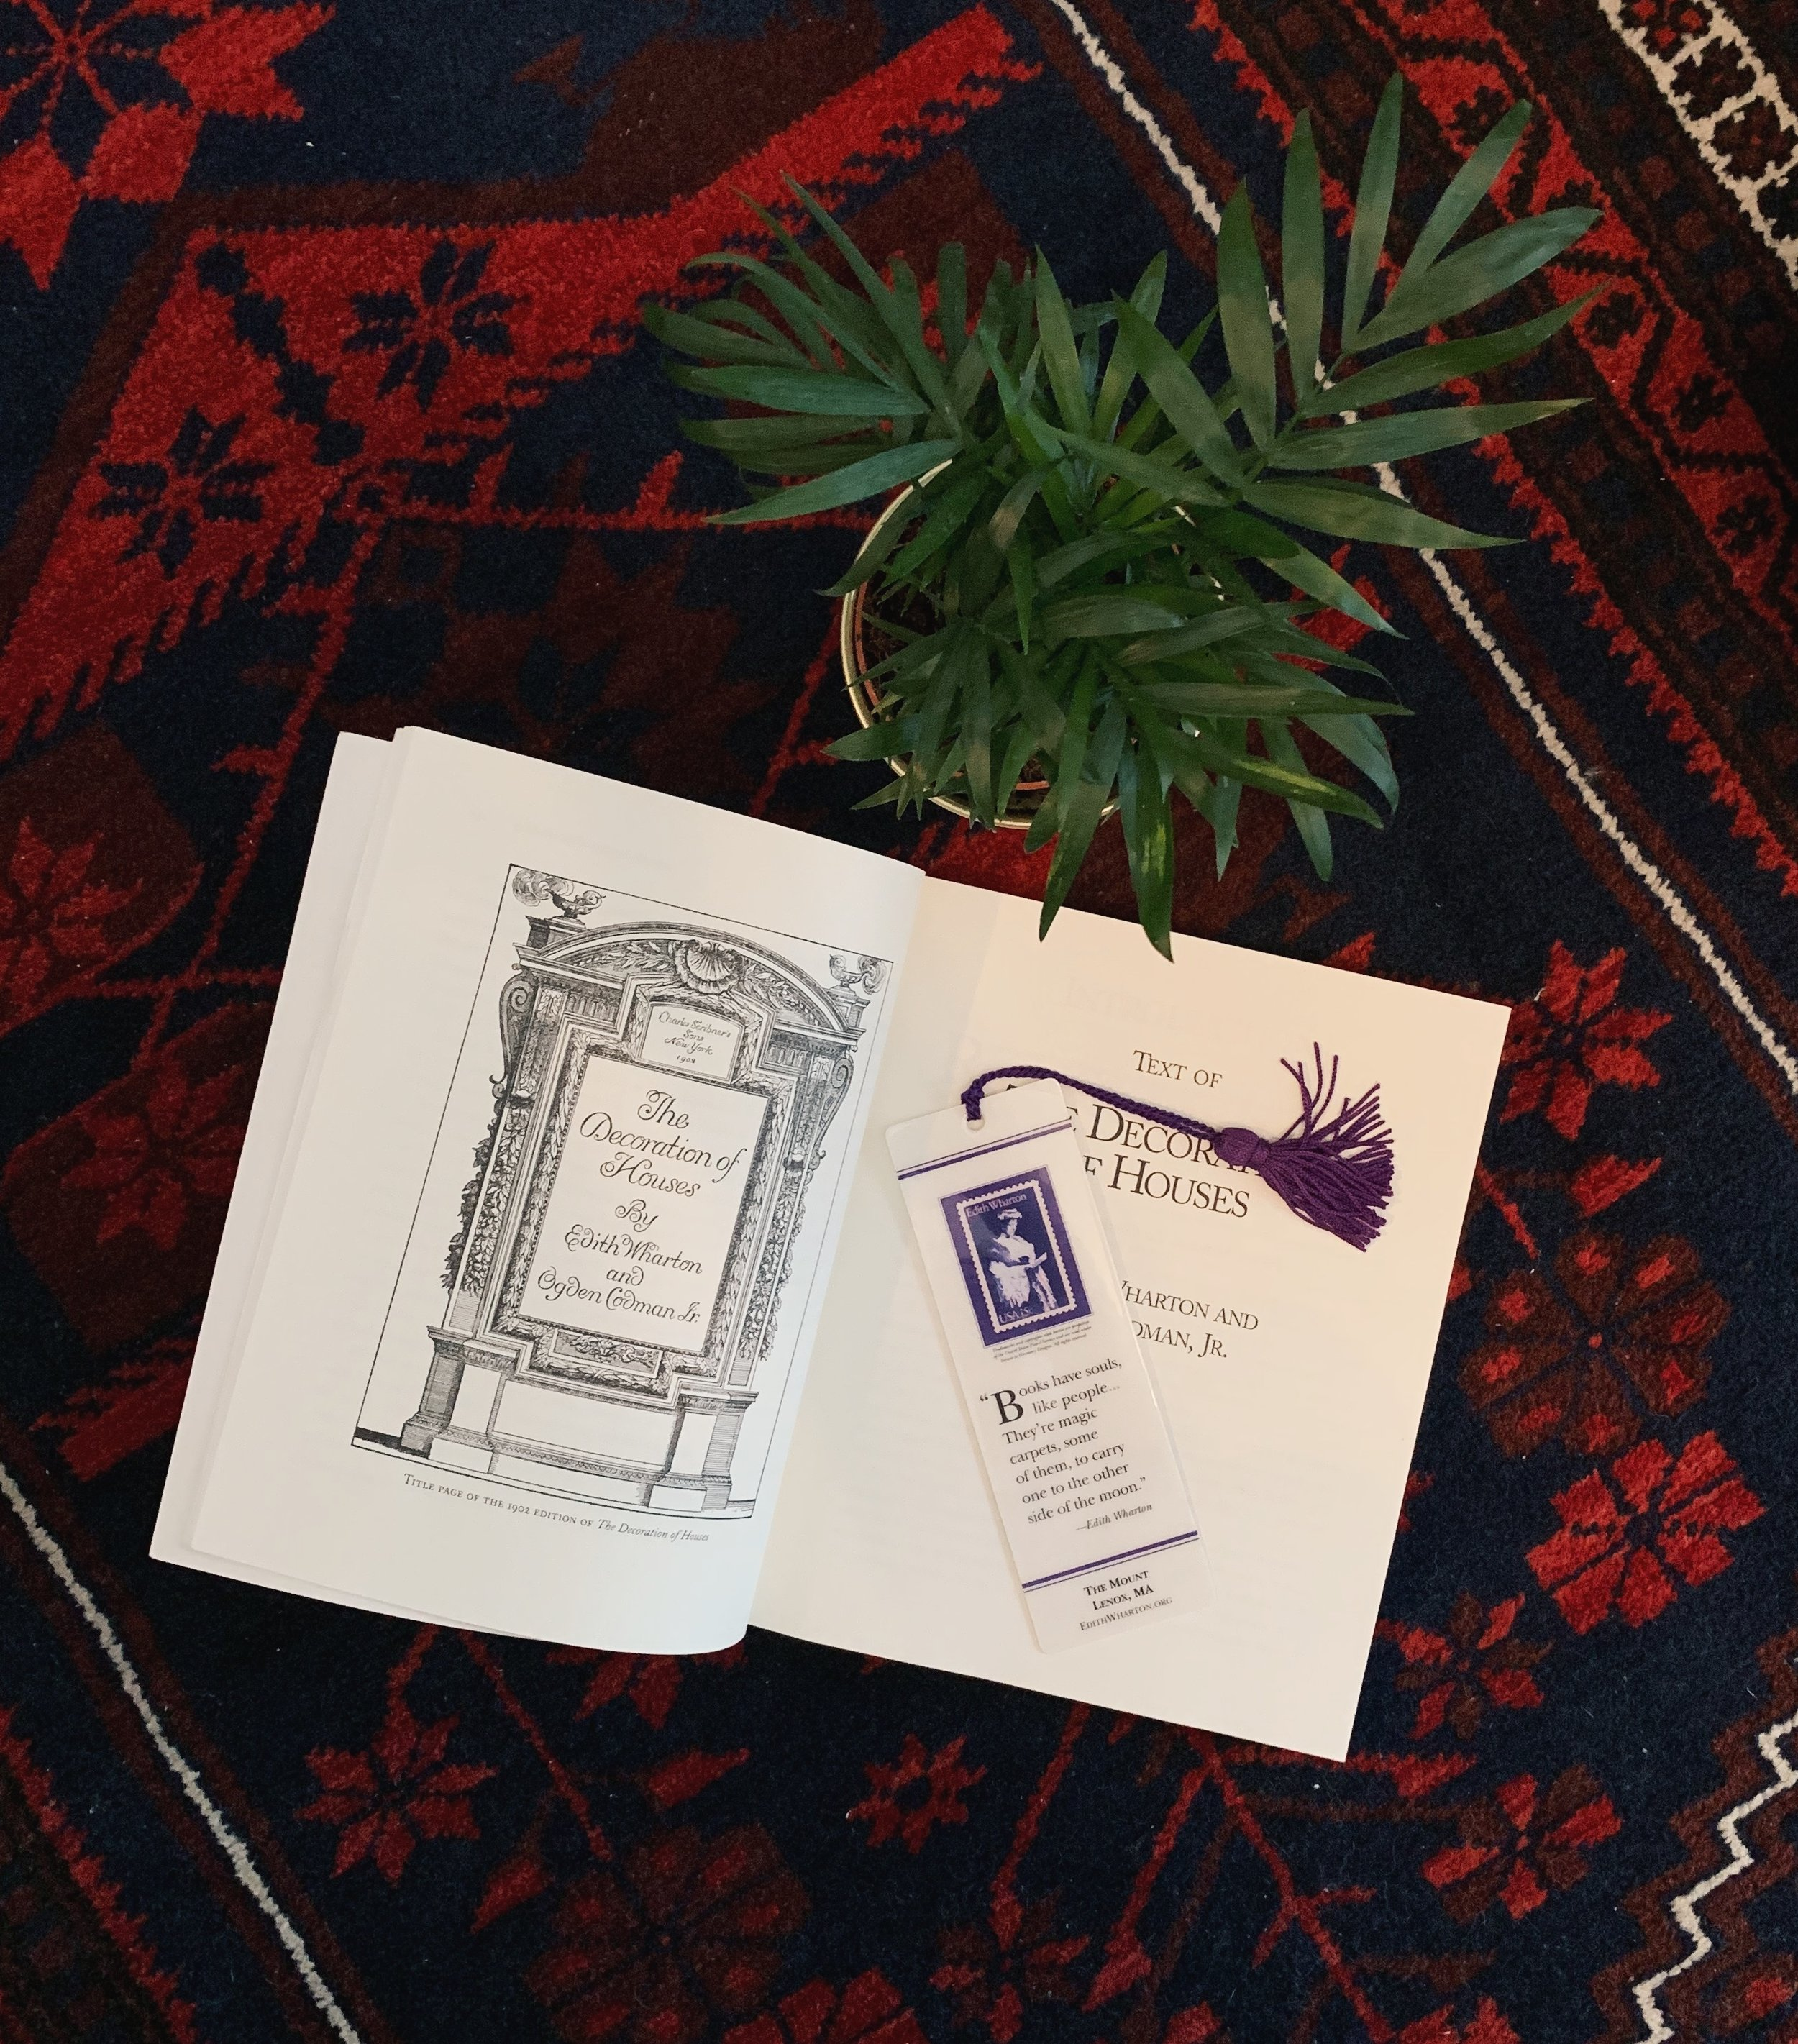 Edith Wharton The Decoration of Houses Interior Design Decorating Tips The Attic on Eighth Olivia Gündüz-Willemin 1.jpg